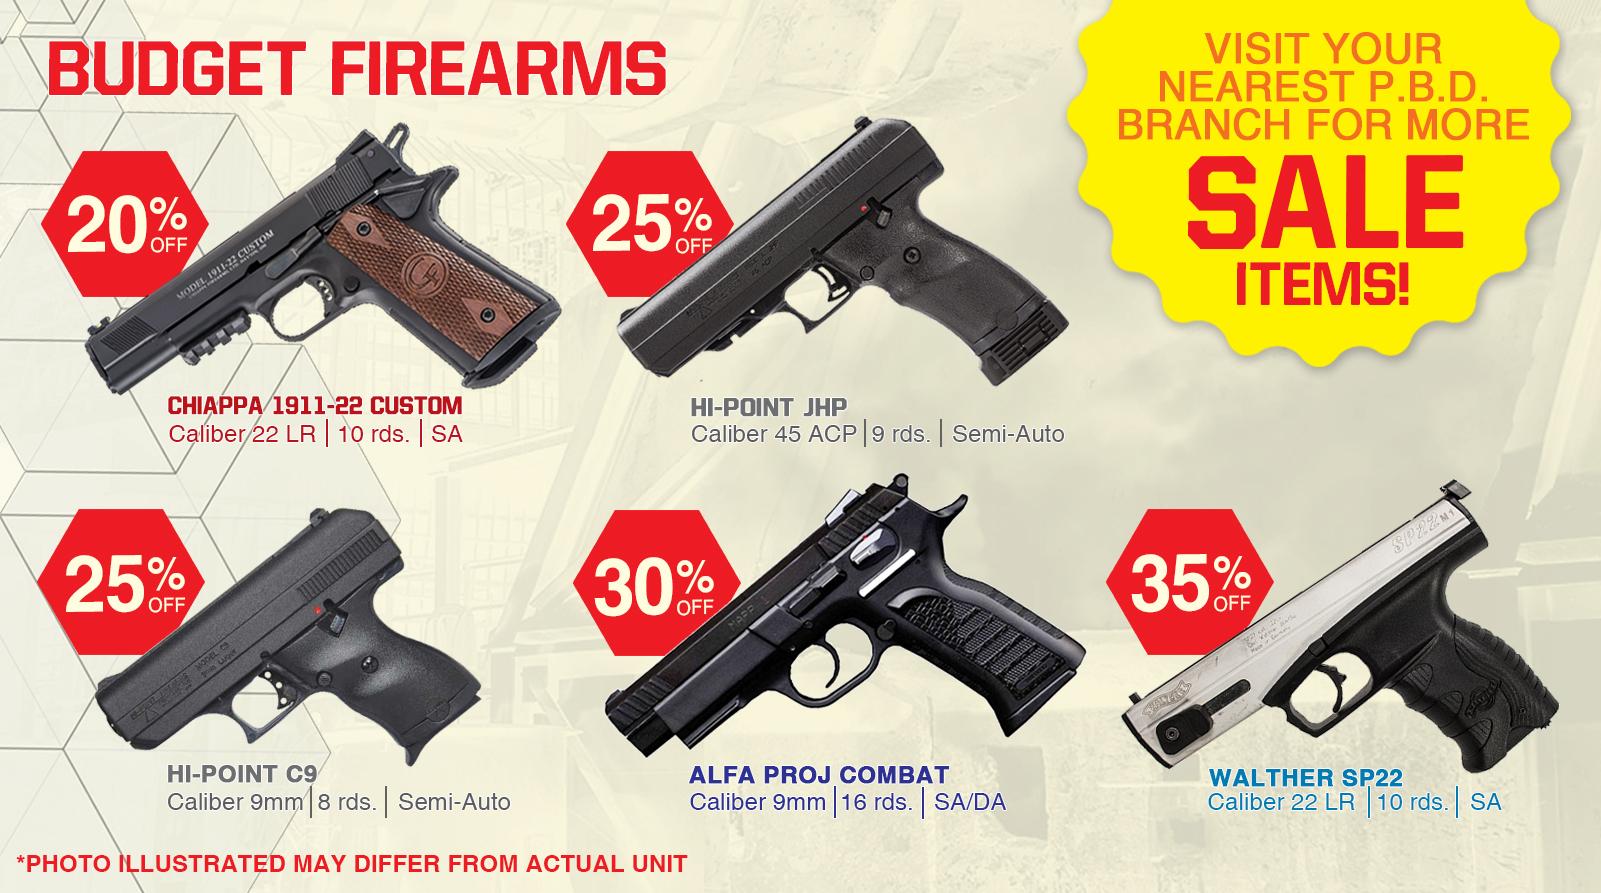 Budget Firearms – P B Dionisio & Co